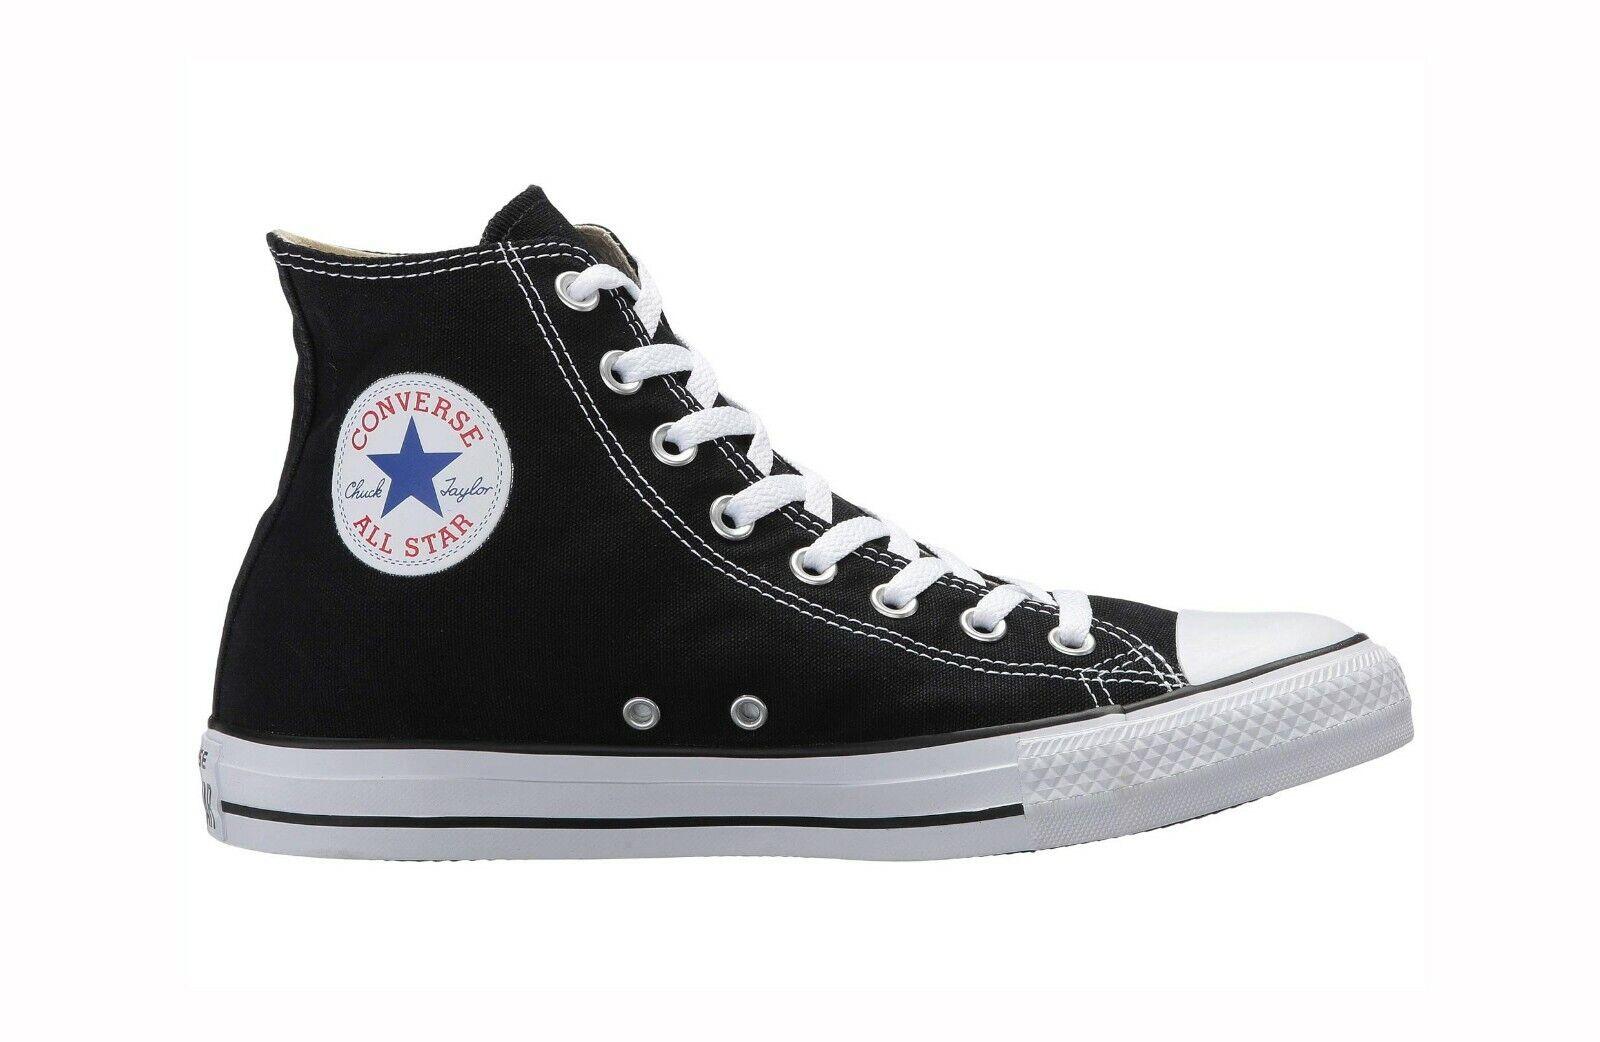 Ciglia Assalto campagna  Converse Chuck Taylor All Star High Top Canvas Men Shoes M9160 Black White  for sale online